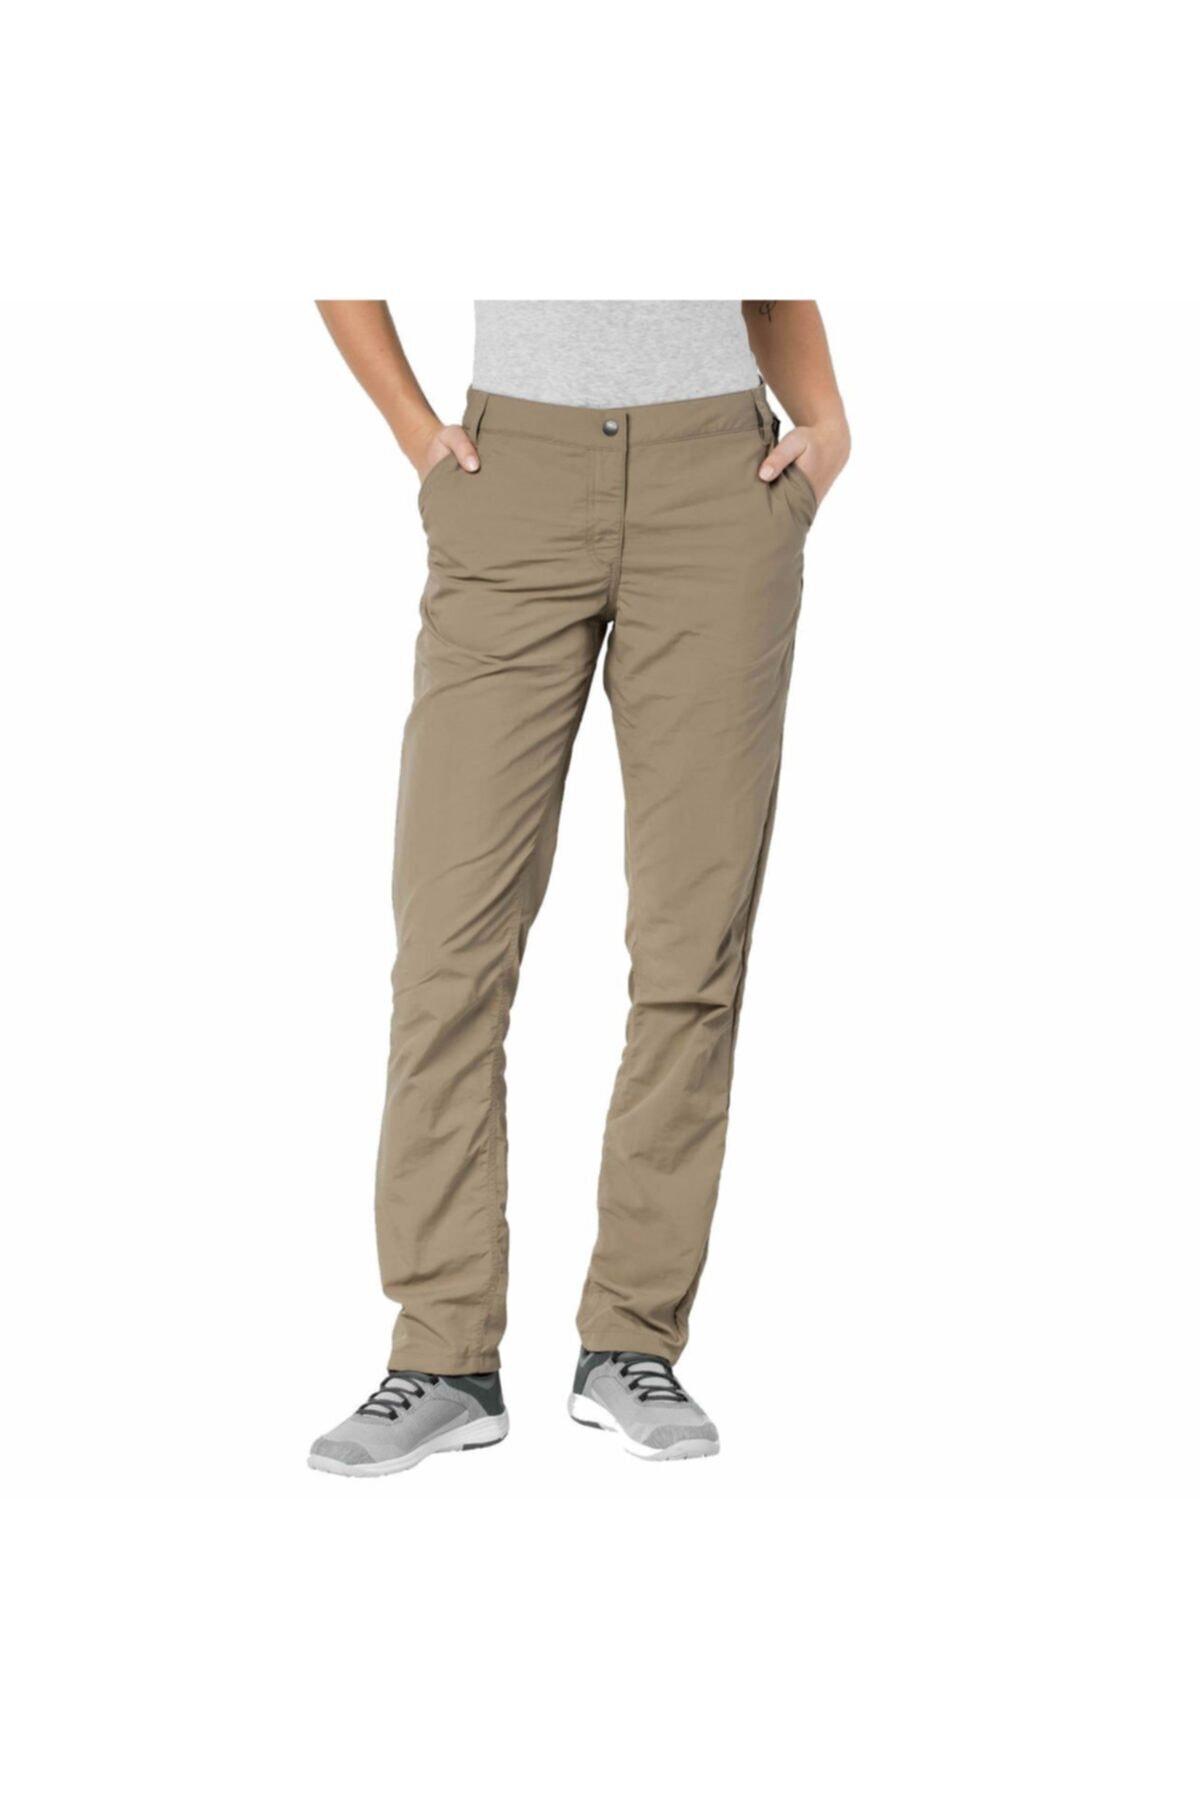 Jack Wolfskin Kalahari Kadın Pantolon 1